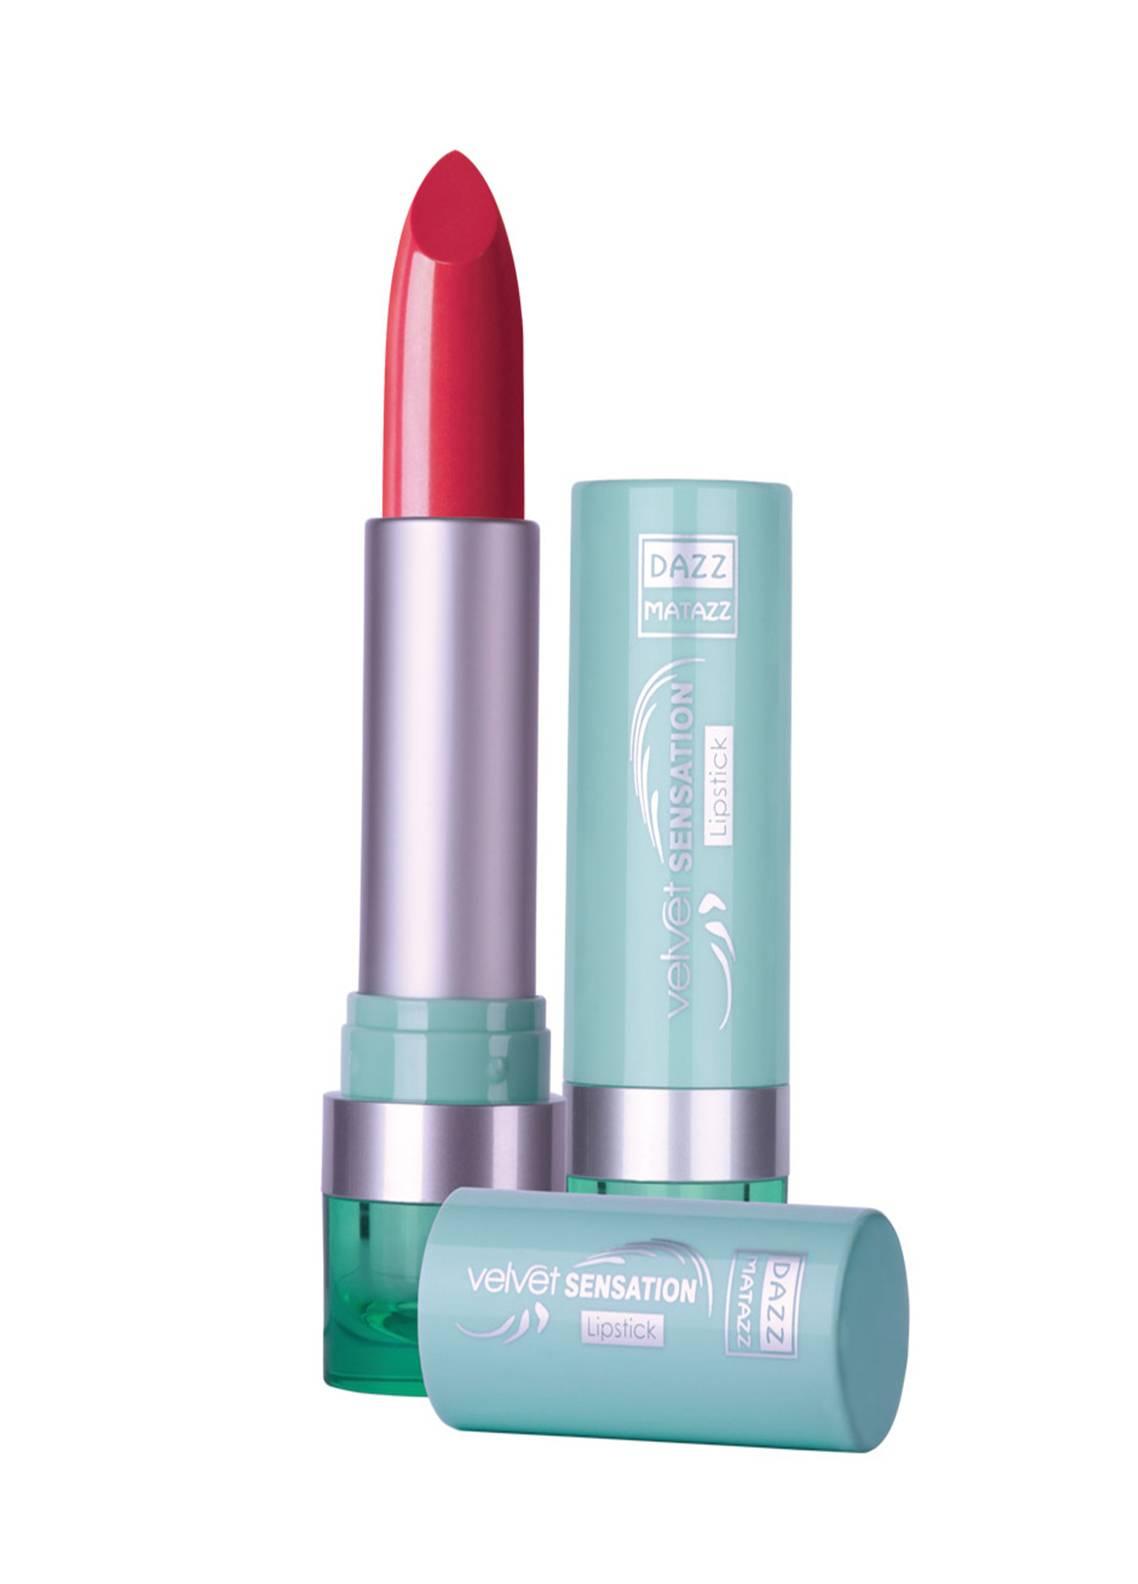 Dazz Matazz Velvet Sensation Lipstick-02 PASSION SORBET